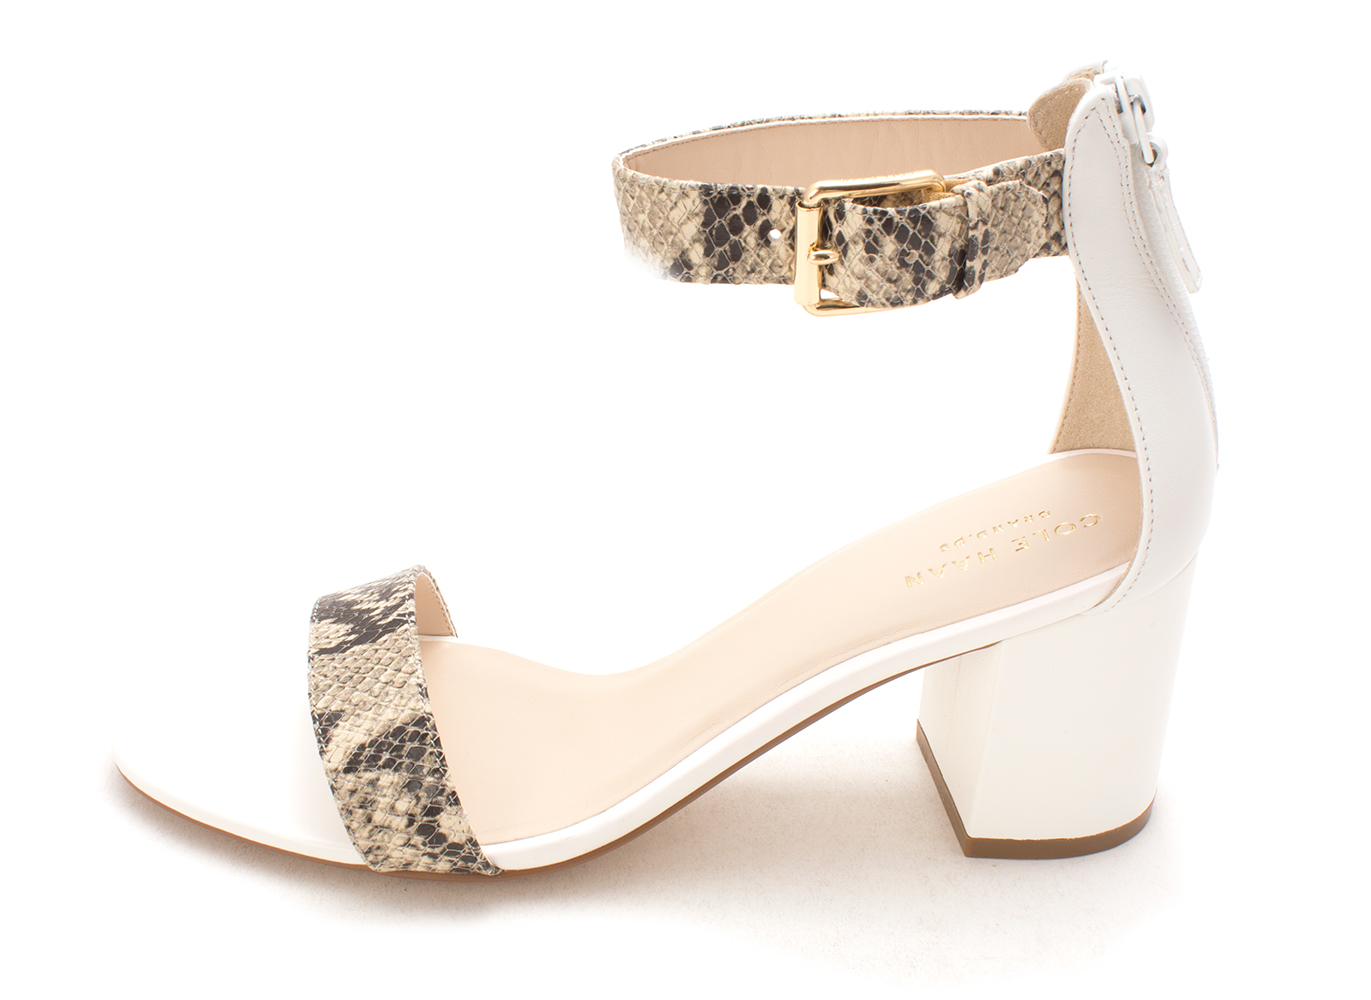 Cole Haan Womens Clarette Sandal II Open Toe Casual Ankle Strap Black Size 65